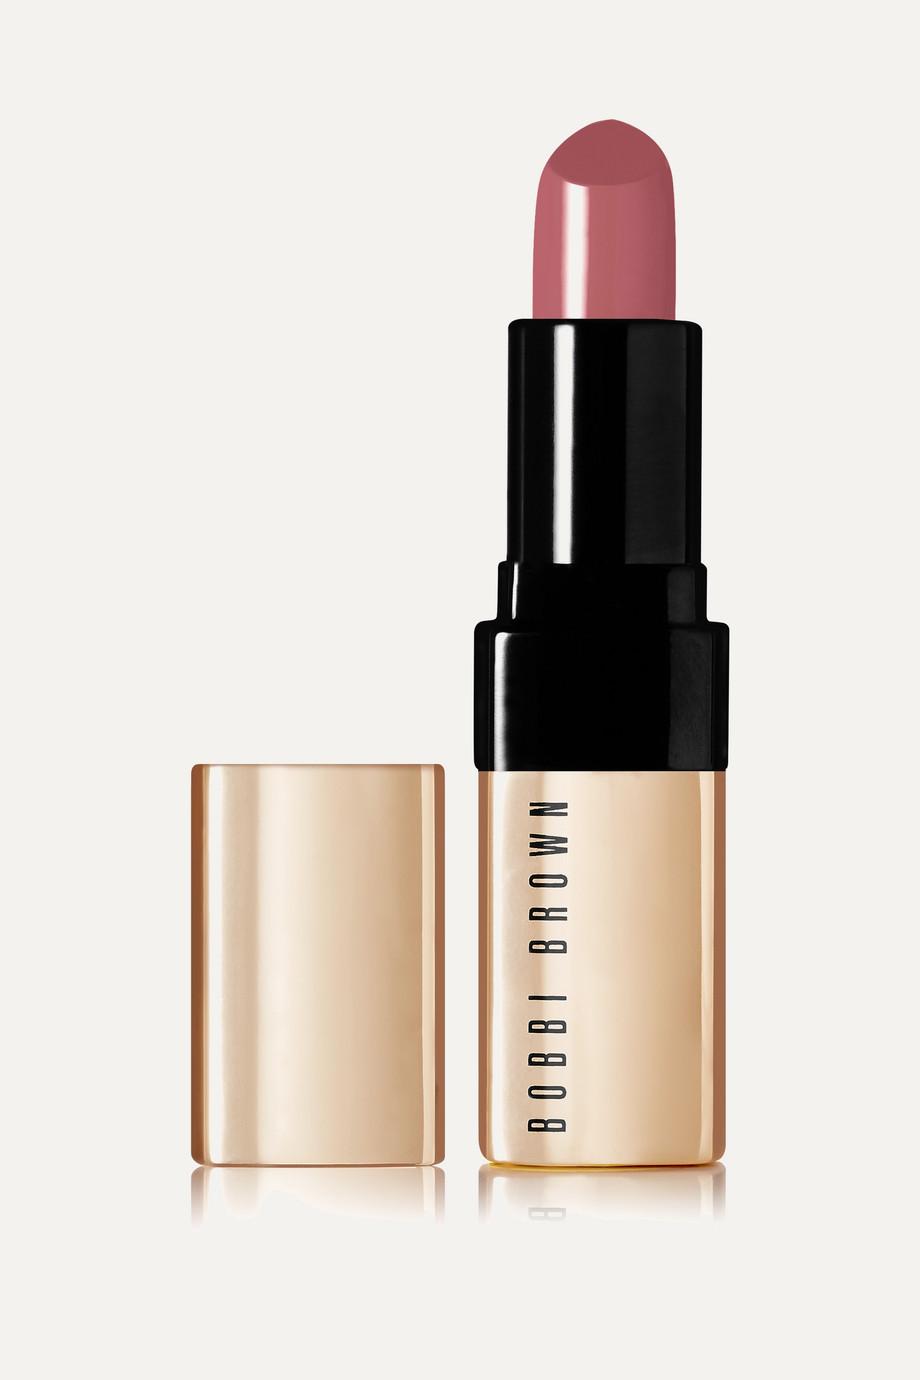 Bobbi Brown Luxe Lip Color - Soft Berry